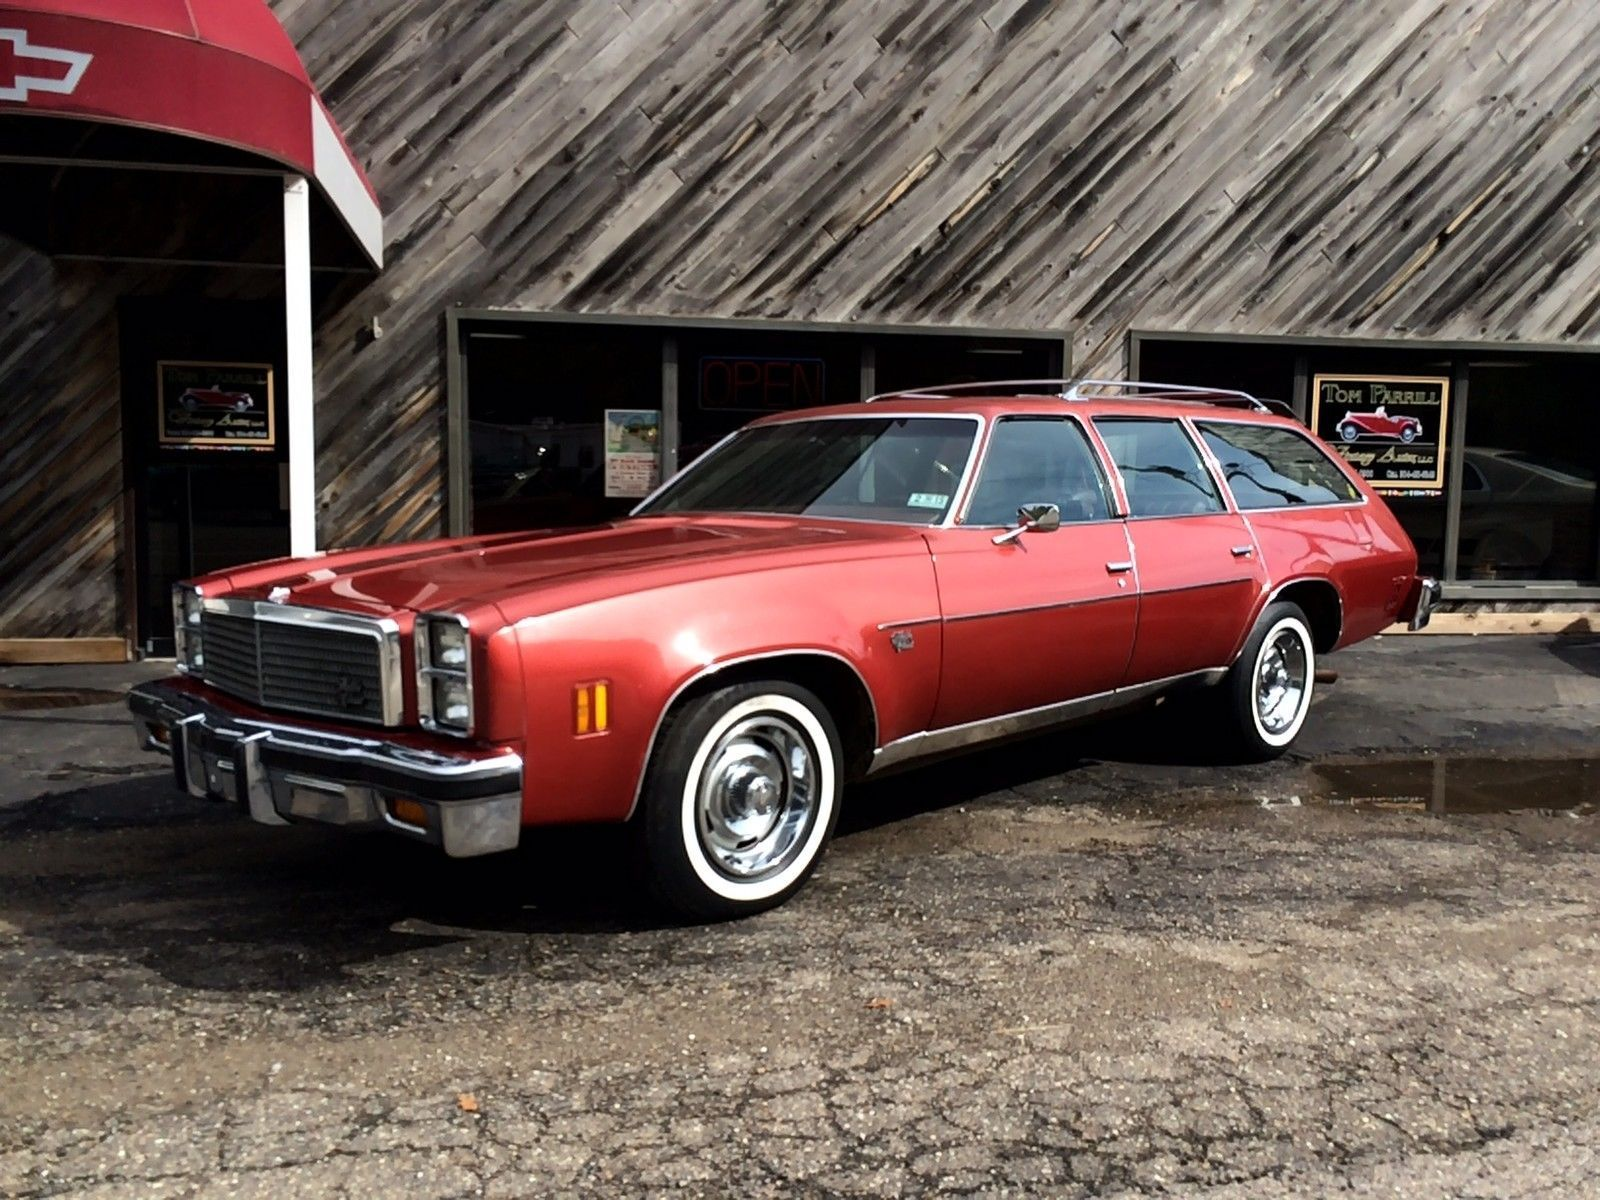 76 Chevrolet Malibu Classic Chevrolet Classic Cars